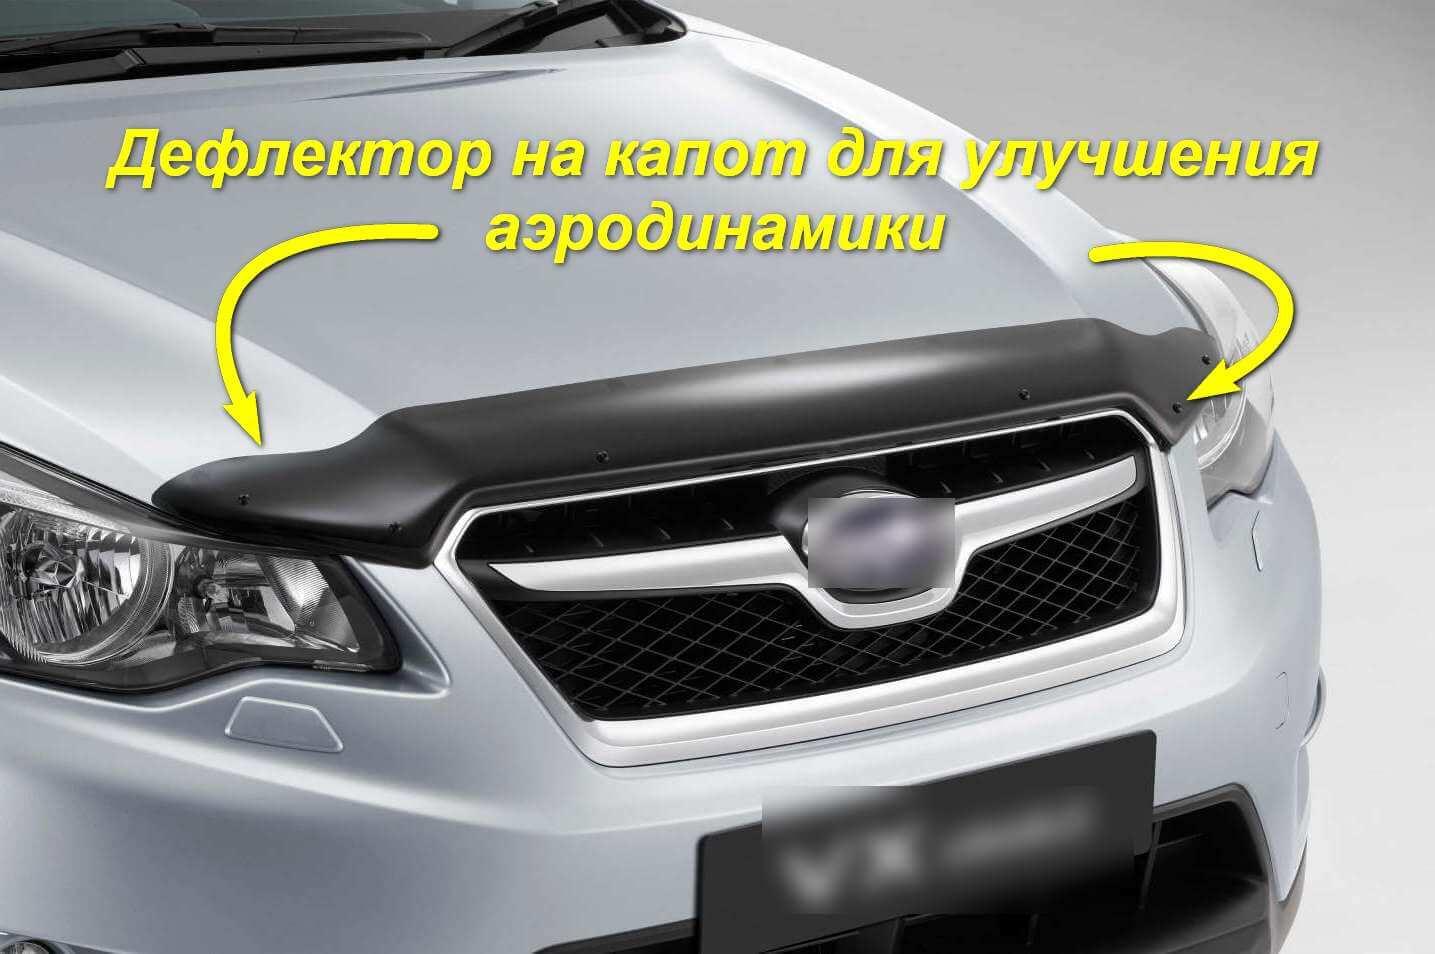 Дефлектор для автомобиля